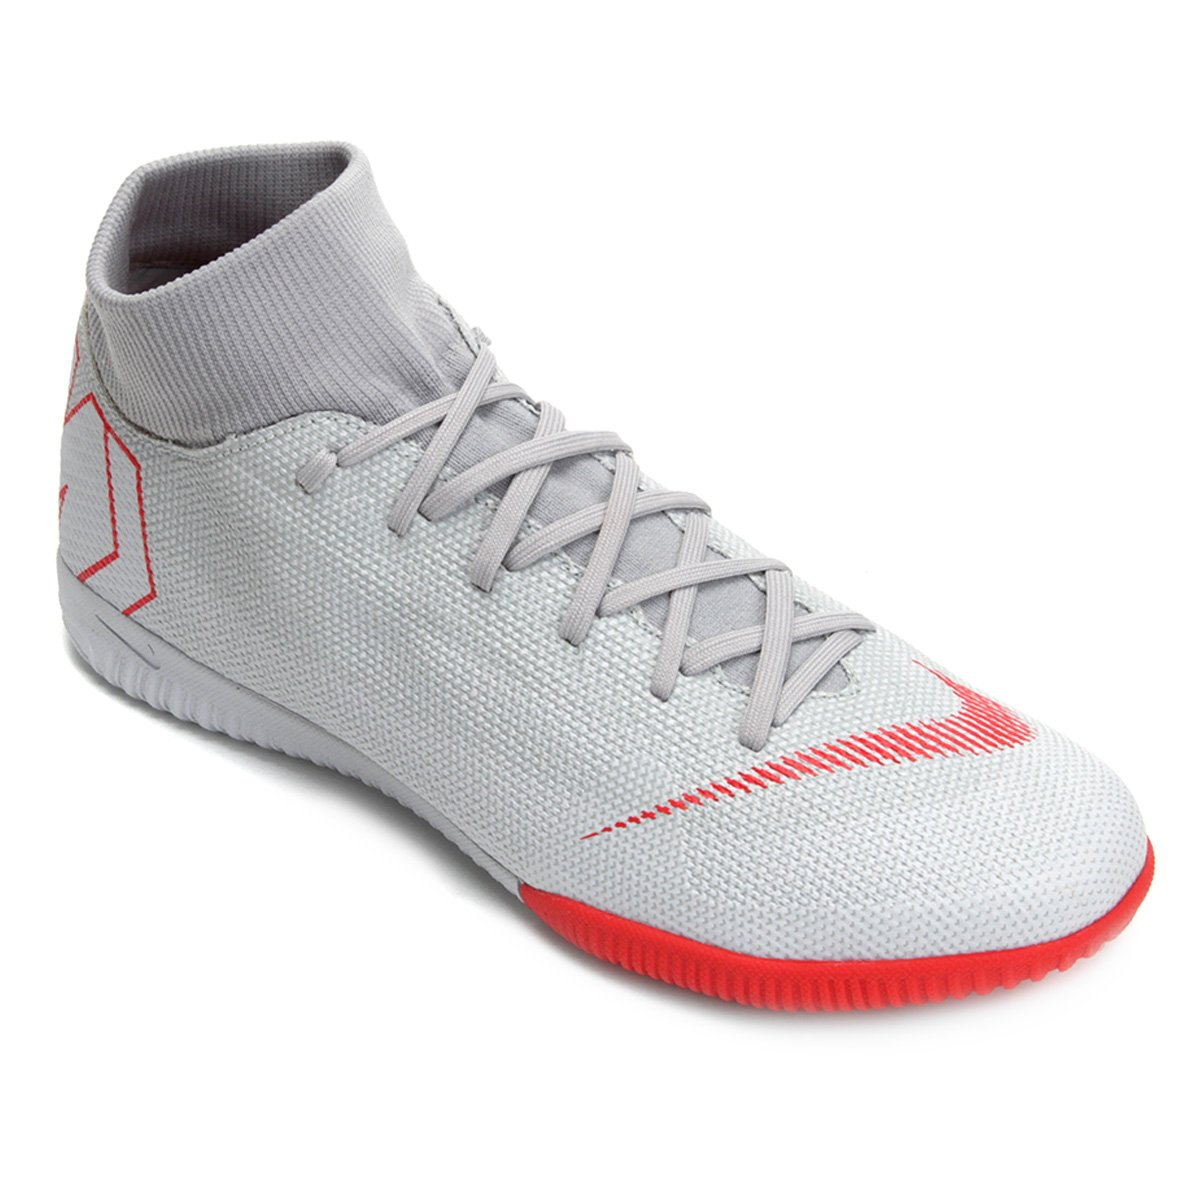 055b57a21c716 Chuteira Futsal Nike Mercurial Superfly 6 Academy - Cinza - Compre ...